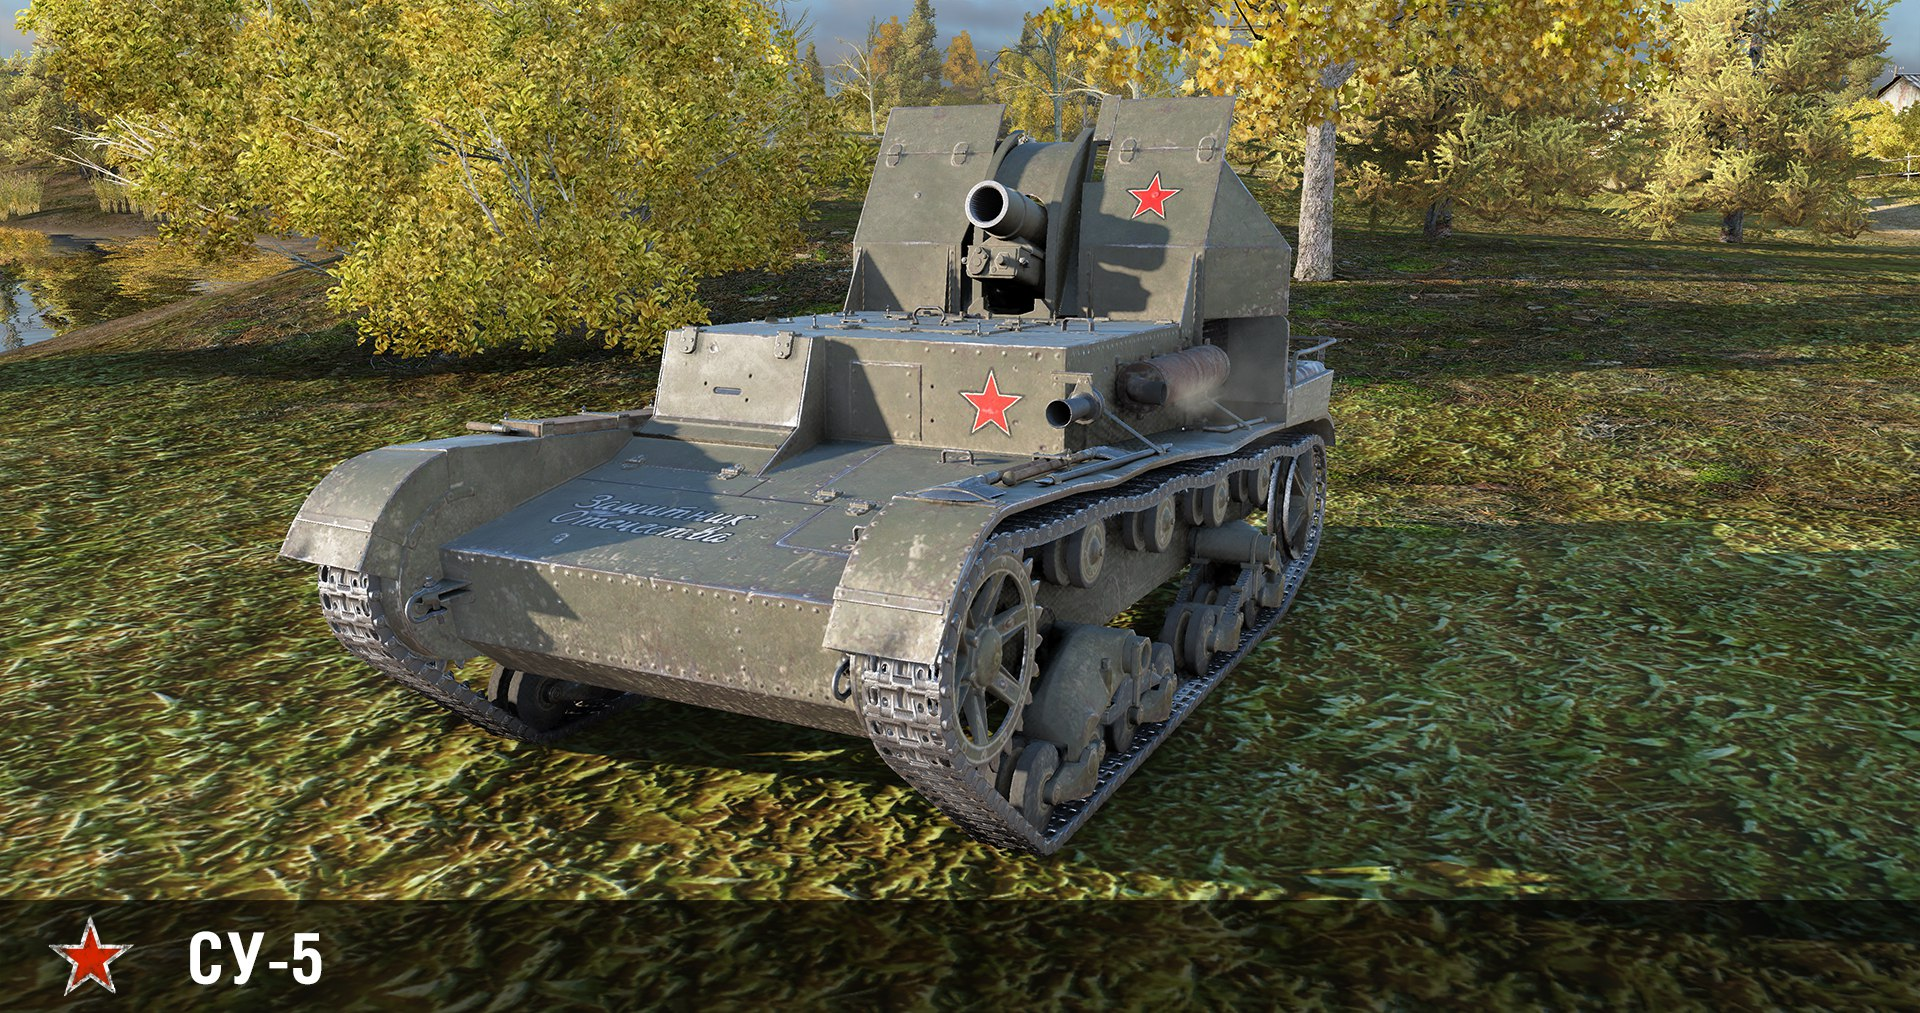 world of tanks blitz pc download free